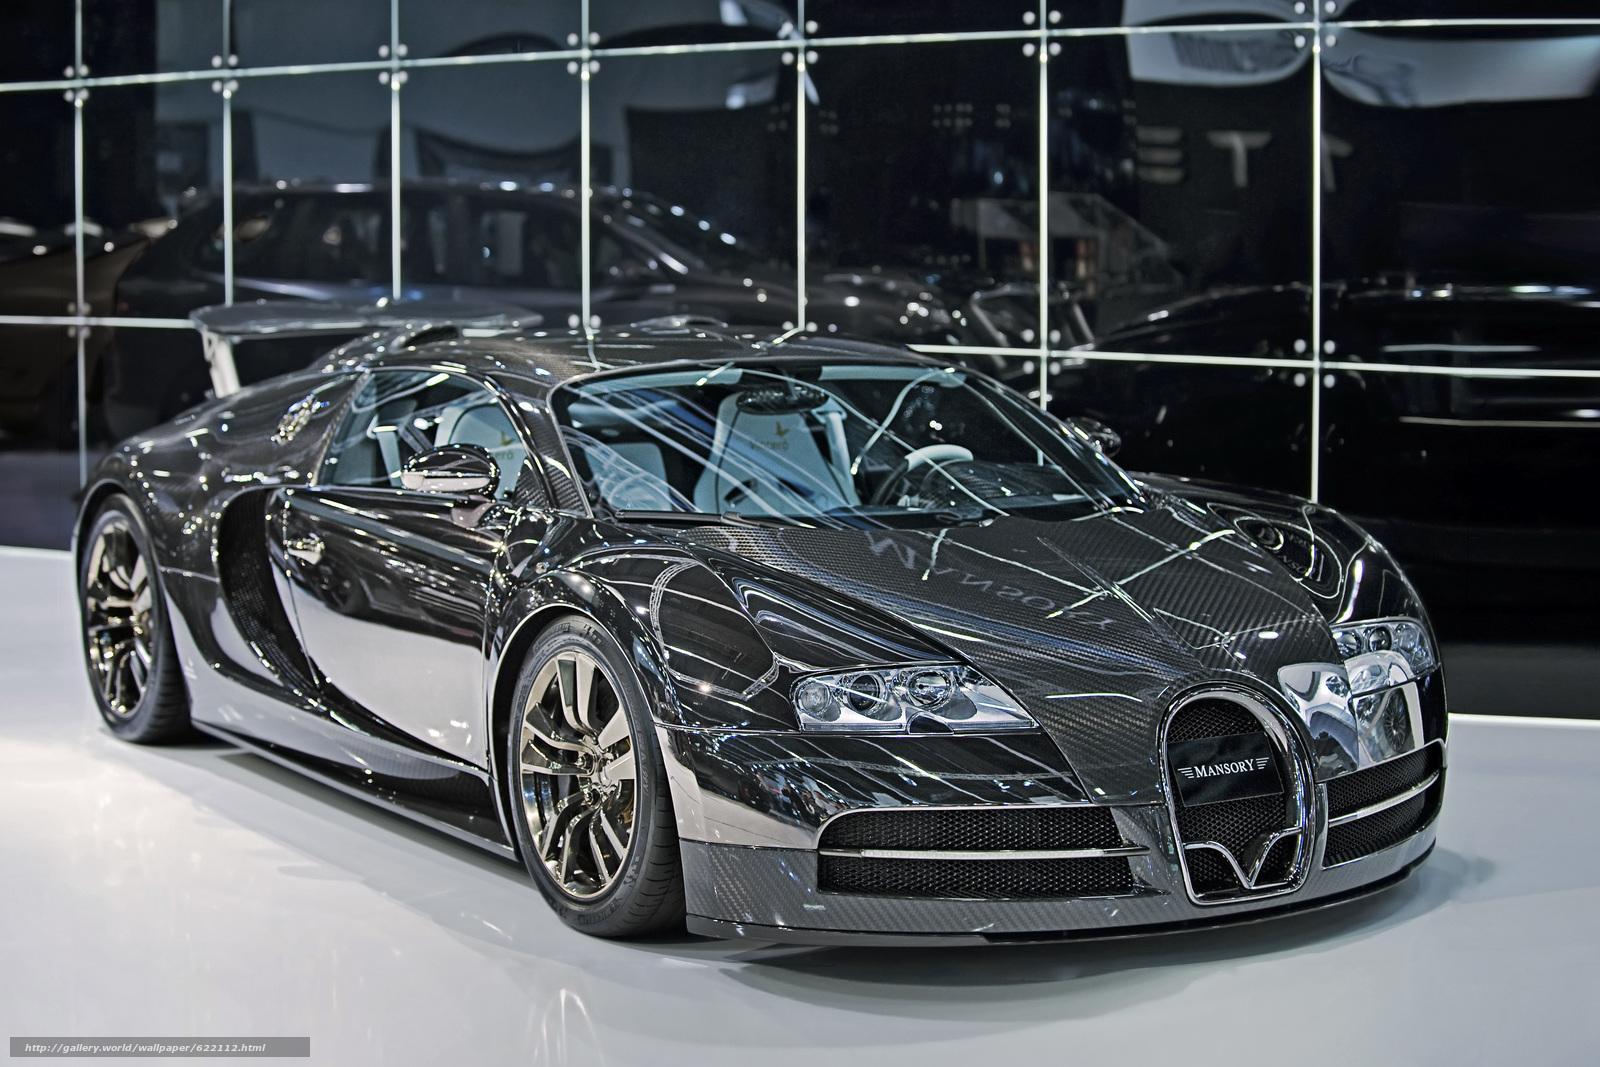 Download wallpaper Bugatti,  Veyron,  giperkar,  Supercar free desktop wallpaper in the resolution 3276x2184 — picture №622112